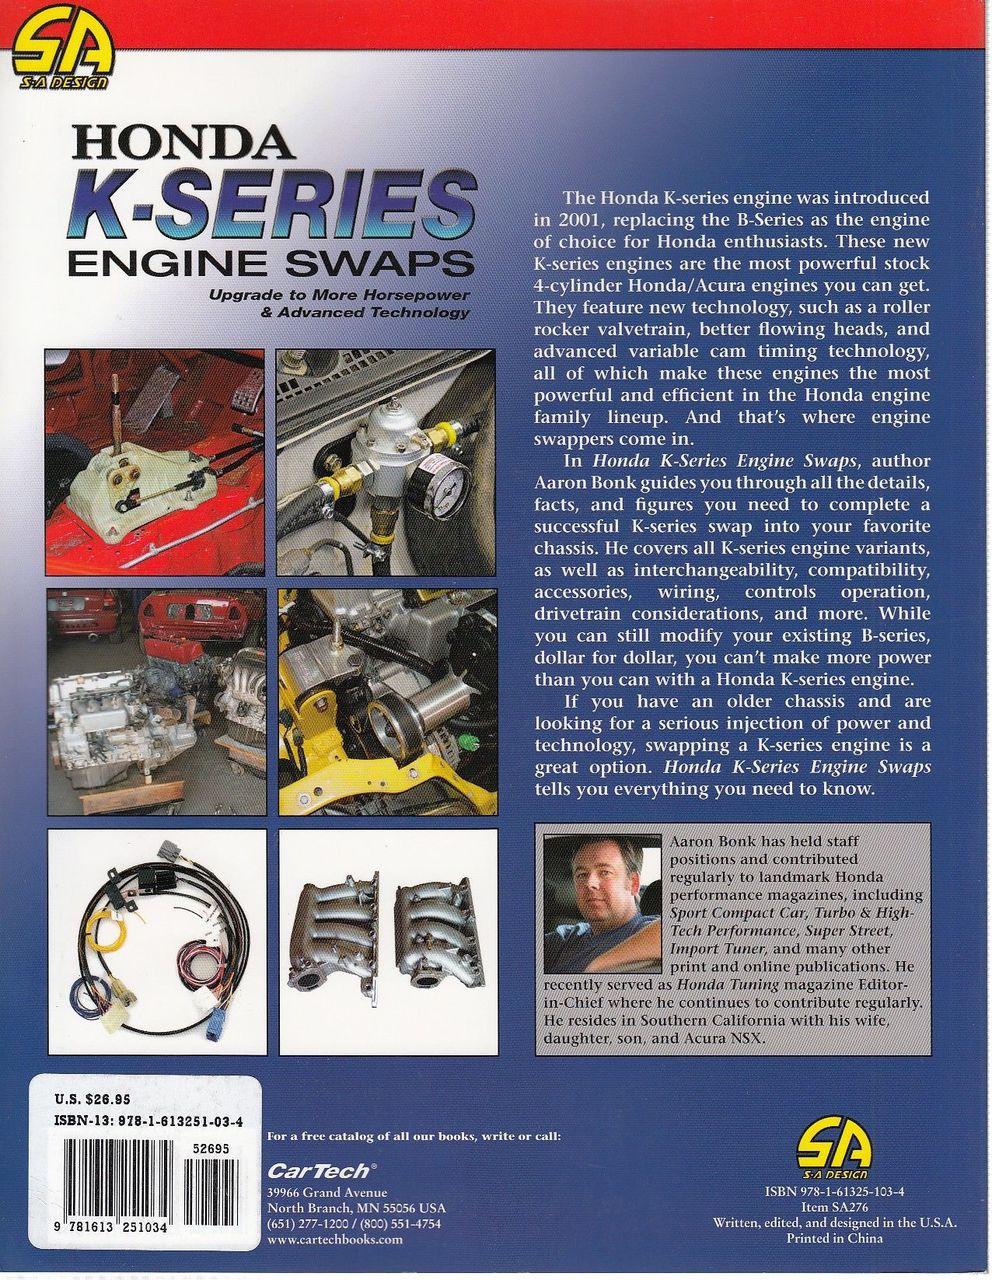 ... Honda K-Series Engine Swaps Back Cover ...